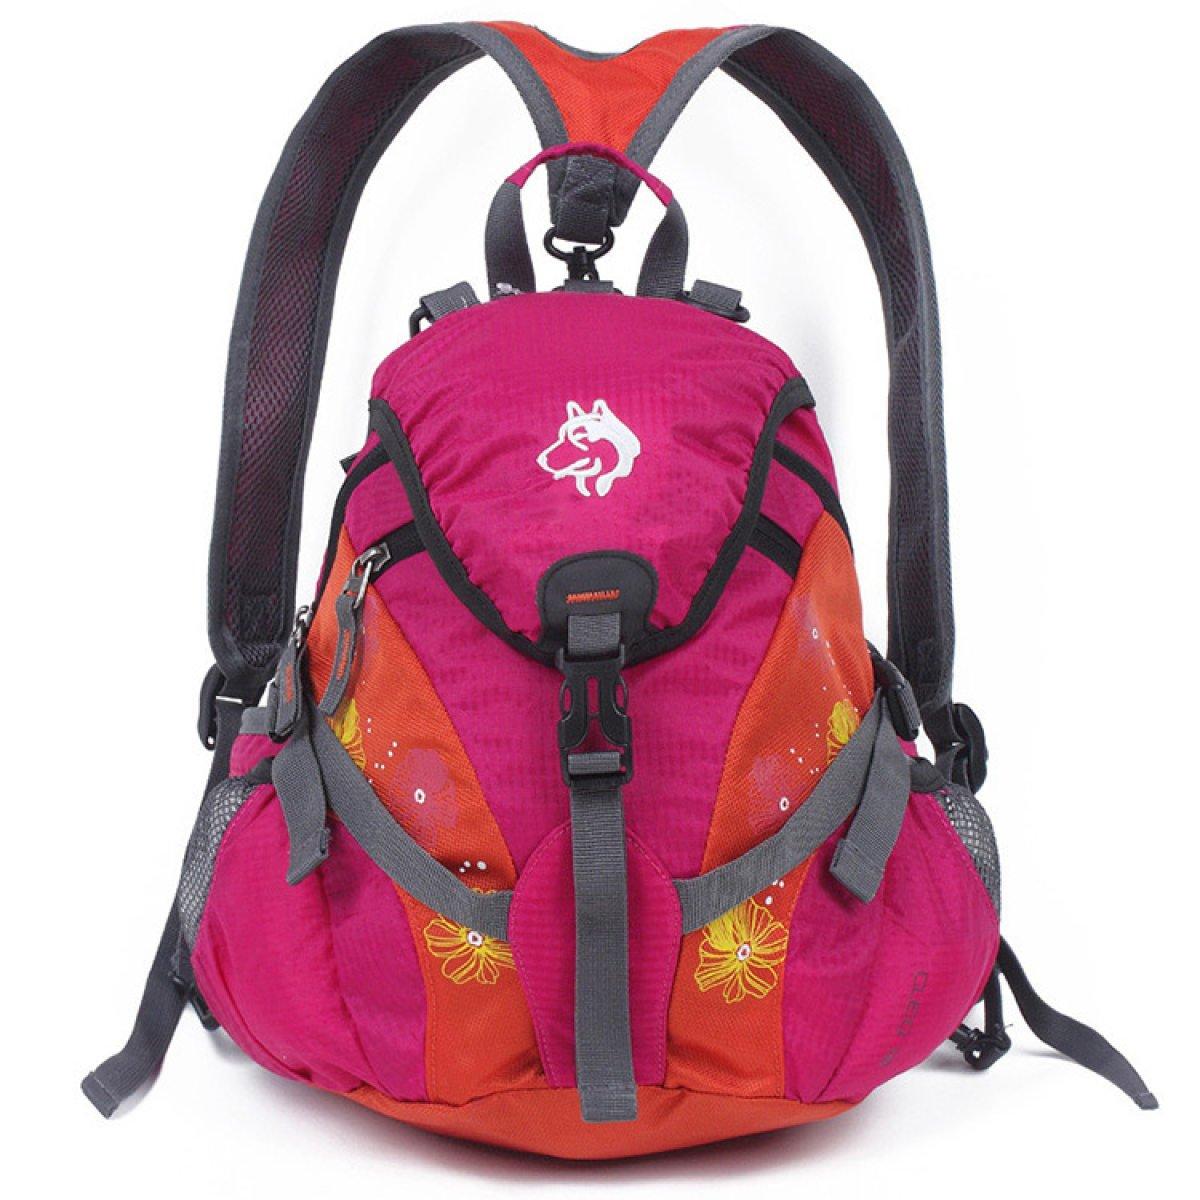 Leichte Bergsteigen Beutel Diagonal Schulter Tasche 15L